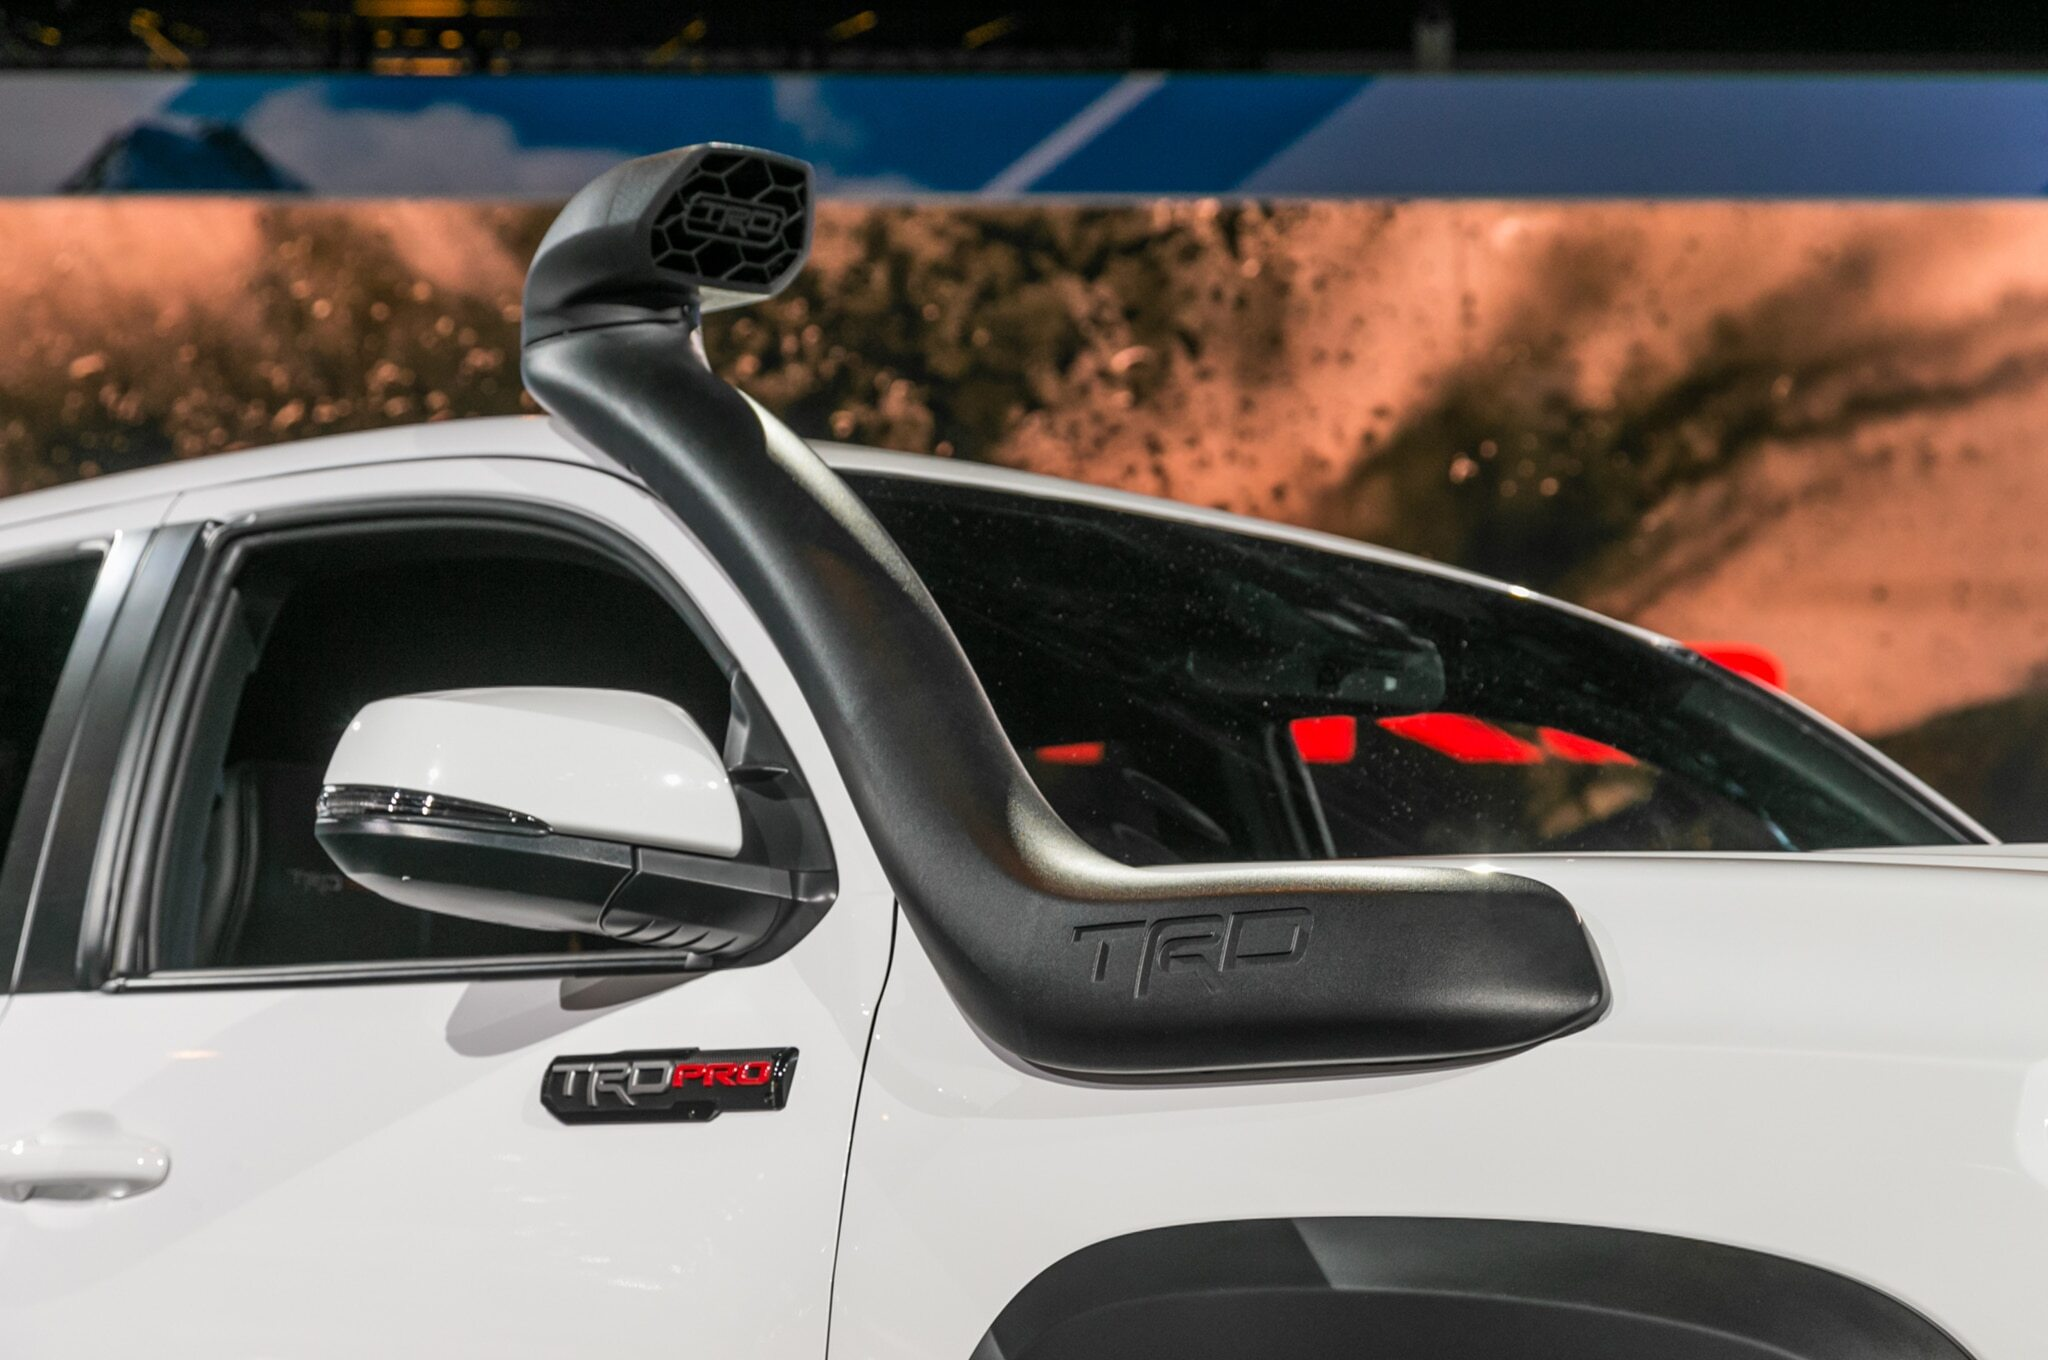 2019-Toyota-Tacoma-TRD-Pro-snorkel-1